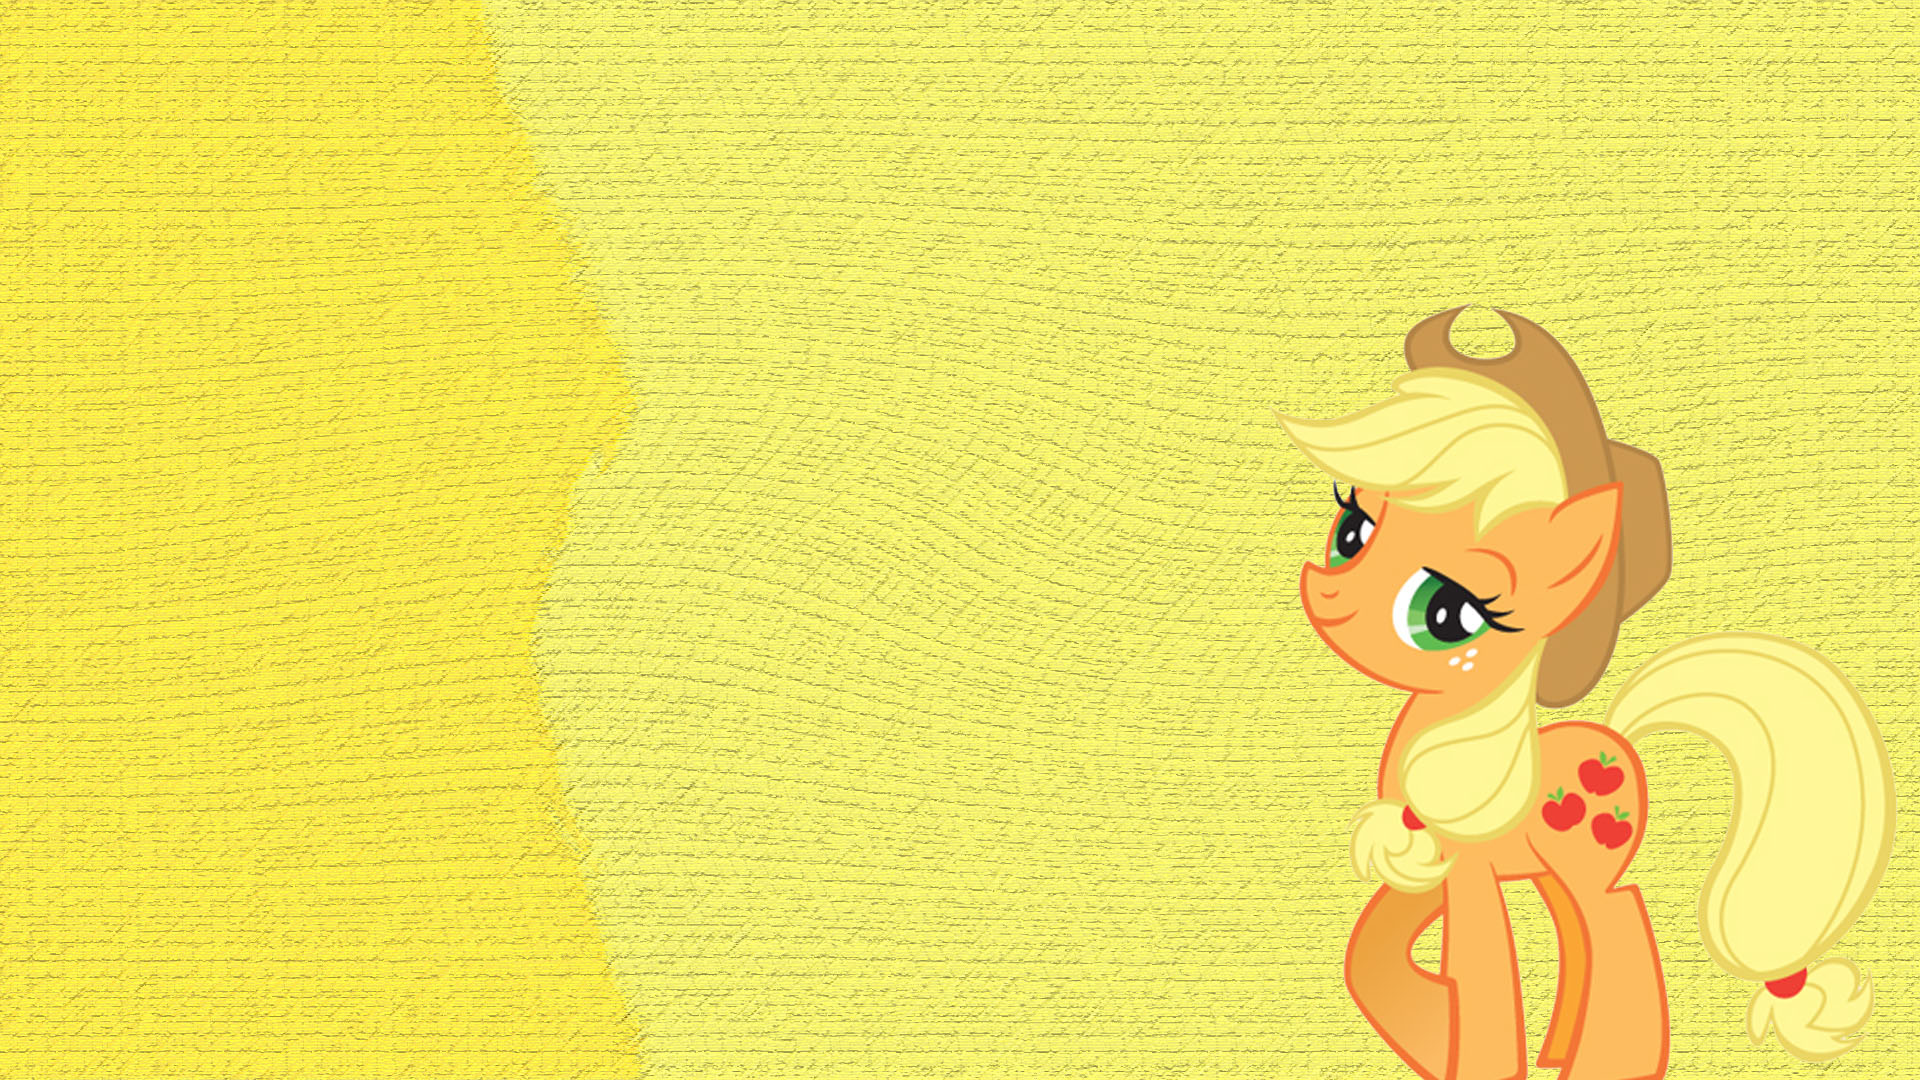 Cute Markiplier Wallpaper Anime Kawaii Wallpapers Pixelstalk Net